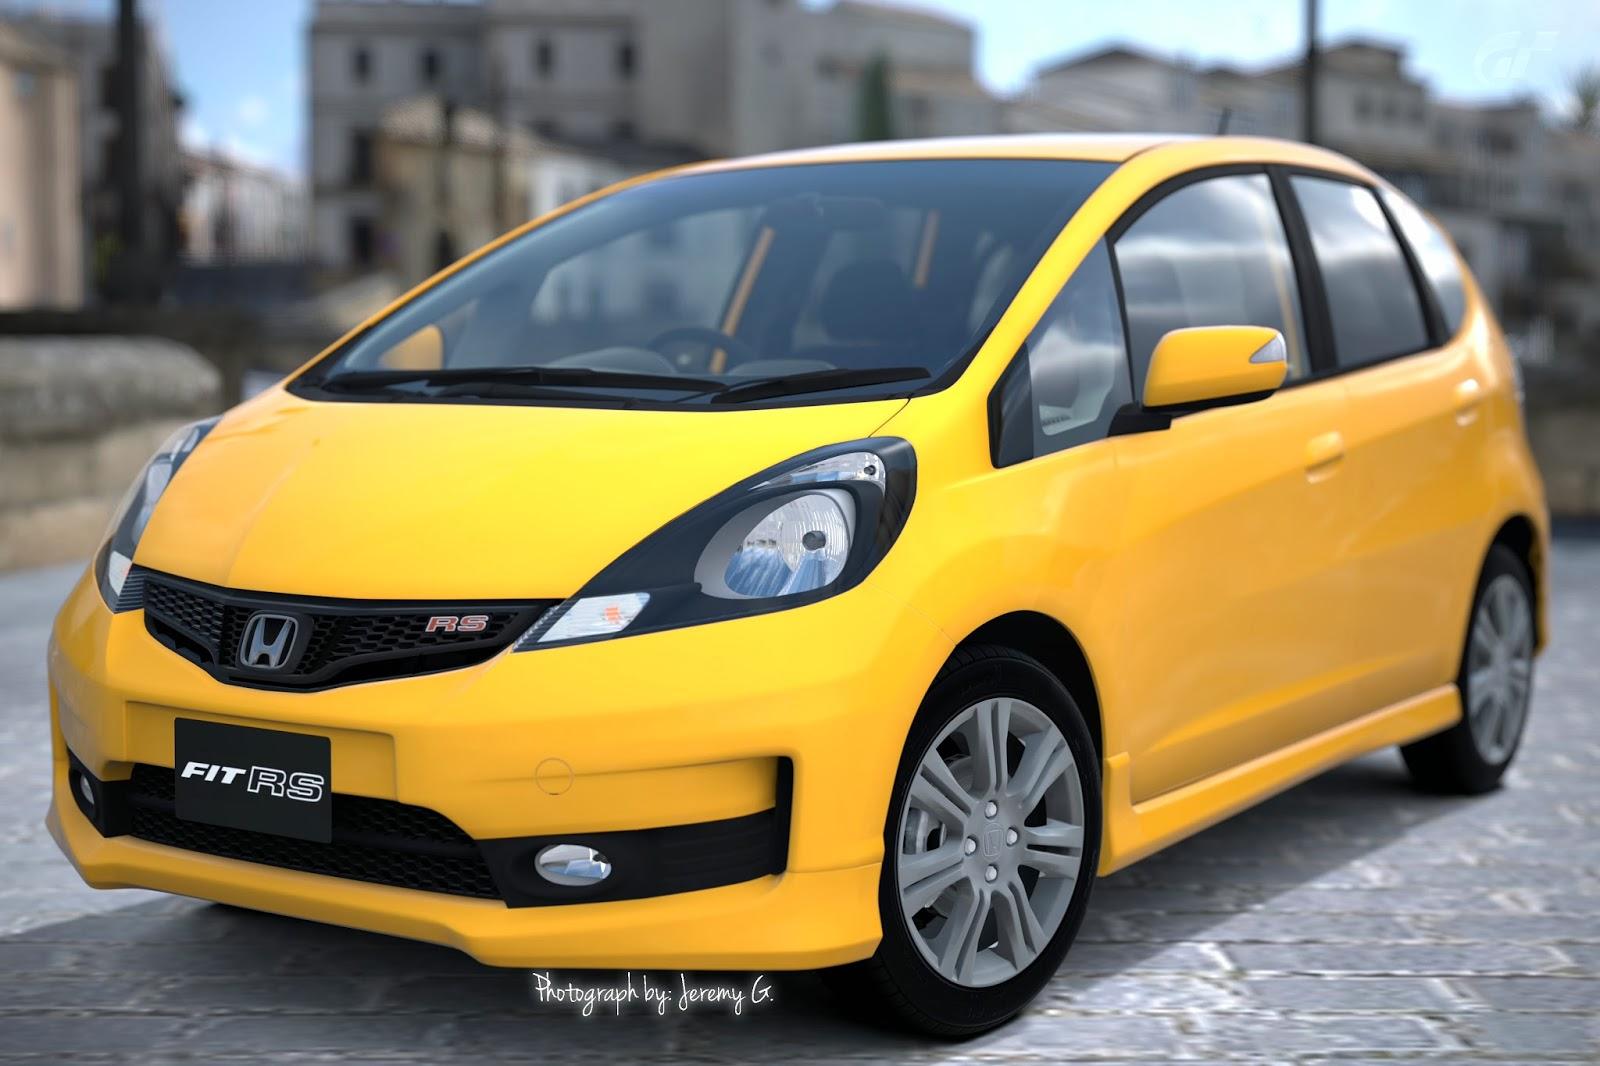 Used 2013 honda fit hatchback features specs edmunds for Honda fit horsepower